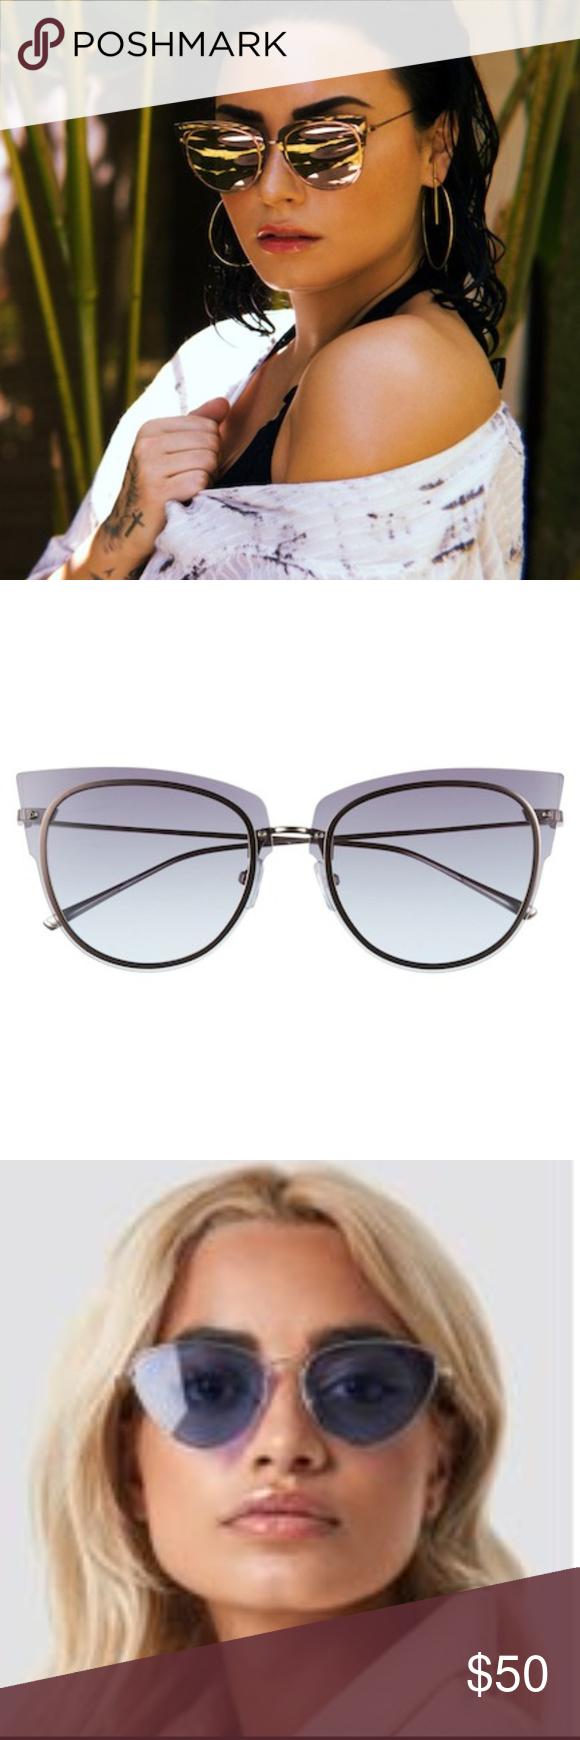 afbe356acc DIFF x Demi Lovato 50mm Rimless Cat Eye Sunglasses DIFF x Demi Lovato DEMI  50mm Rimless Cat Eye Sunglasses. Rose Gold Purple. New.